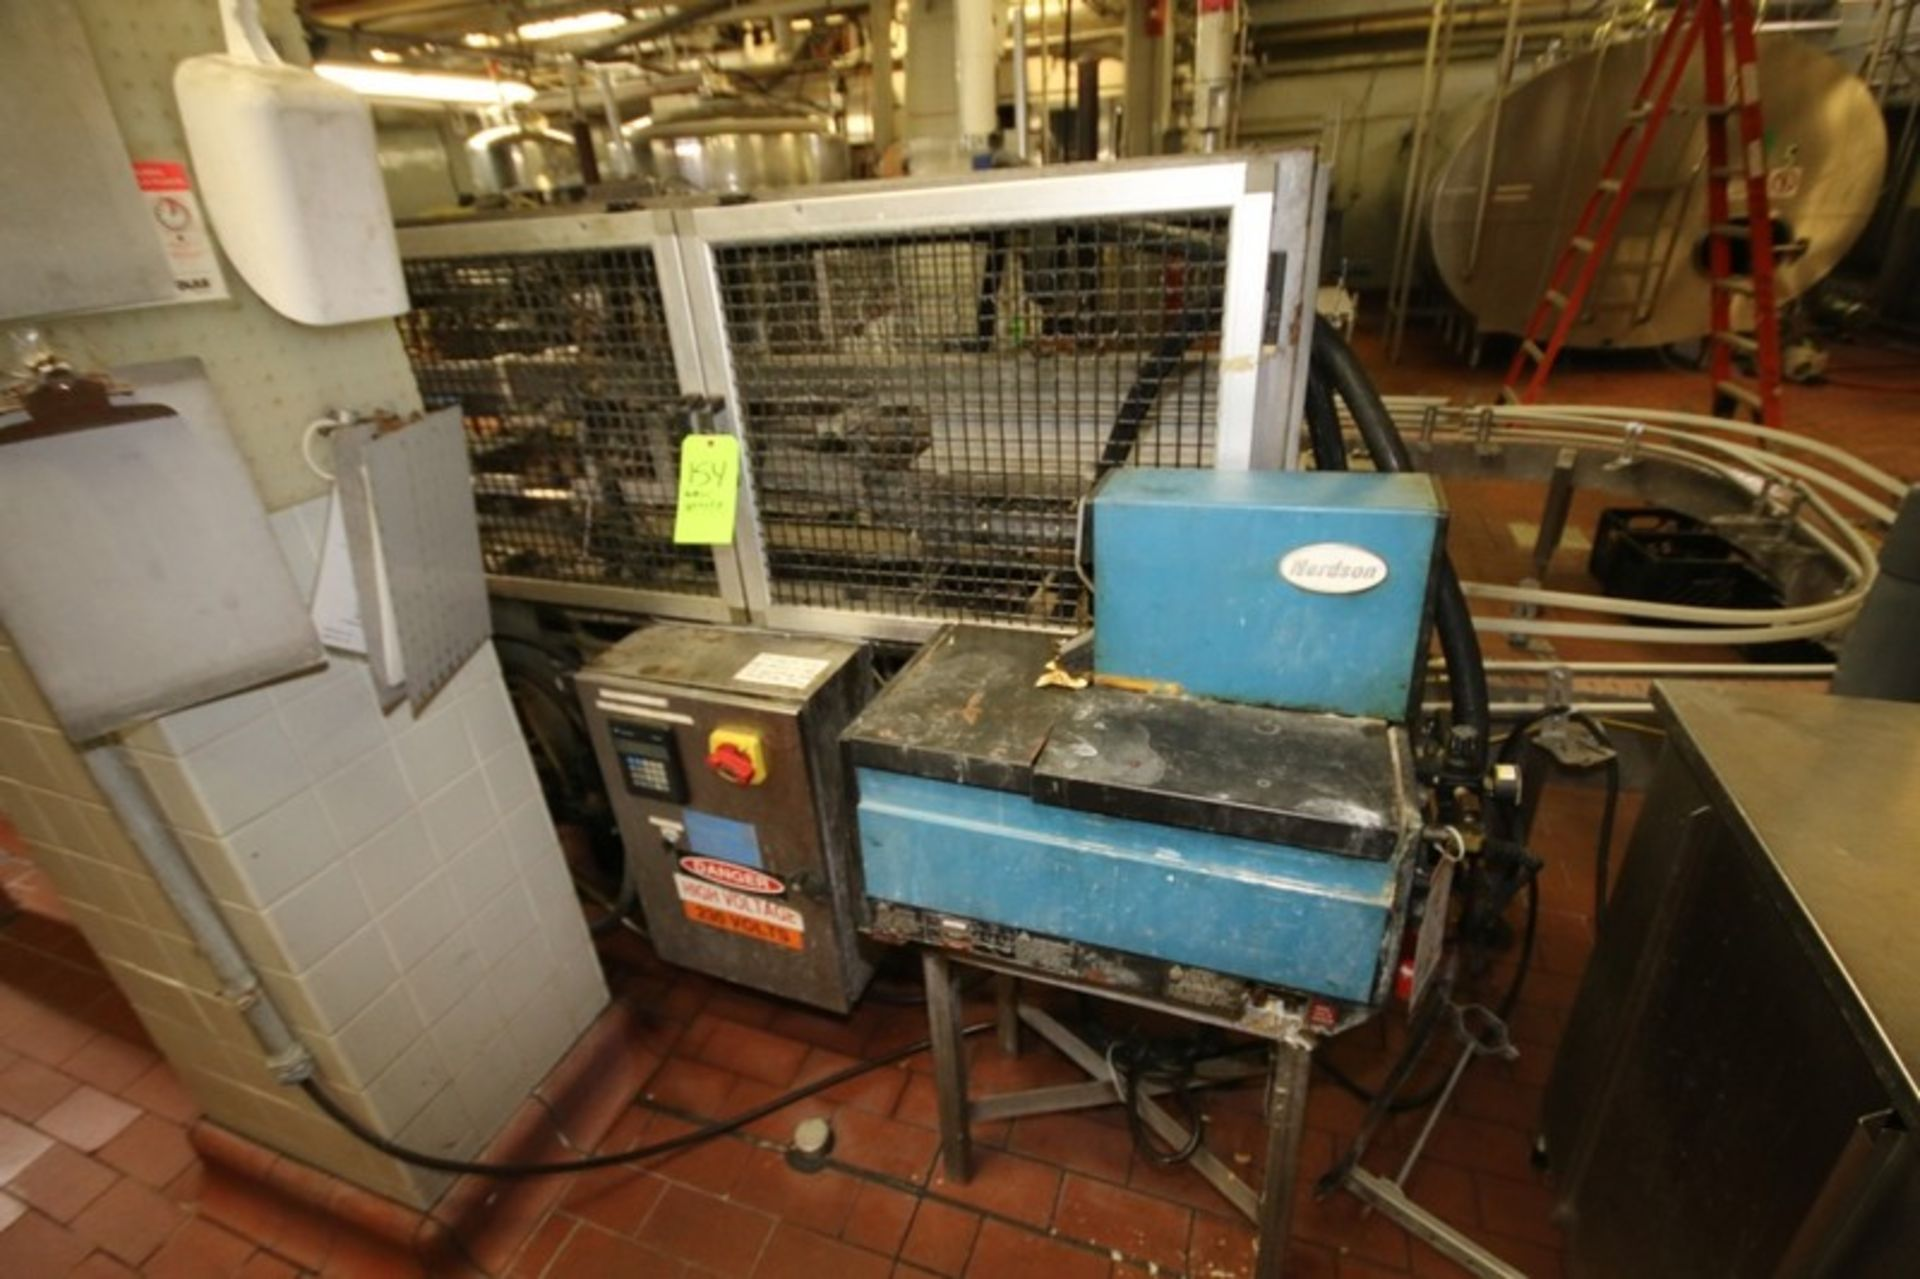 Lot 93 - SWF Corrugated Case Sealer; Hot Melt Design with Nordsen Glue System: includes Allen Bradley Micro